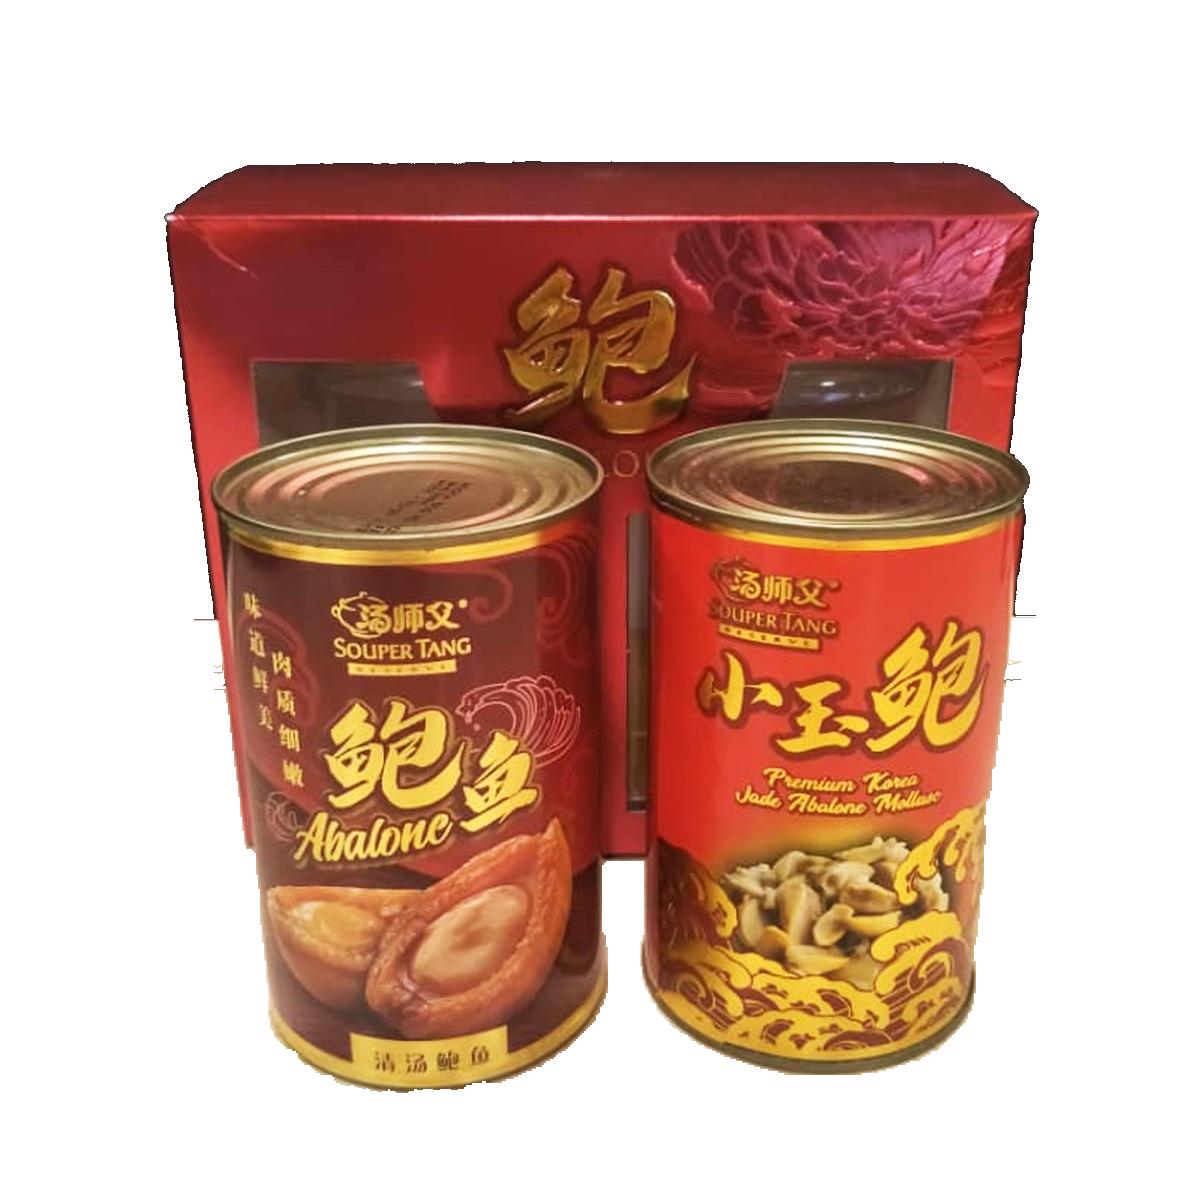 Souper Tang Soup Abalone 425g + Jade Abalone Korea 425g (汤师父清汤鲍鱼+小玉鲍)